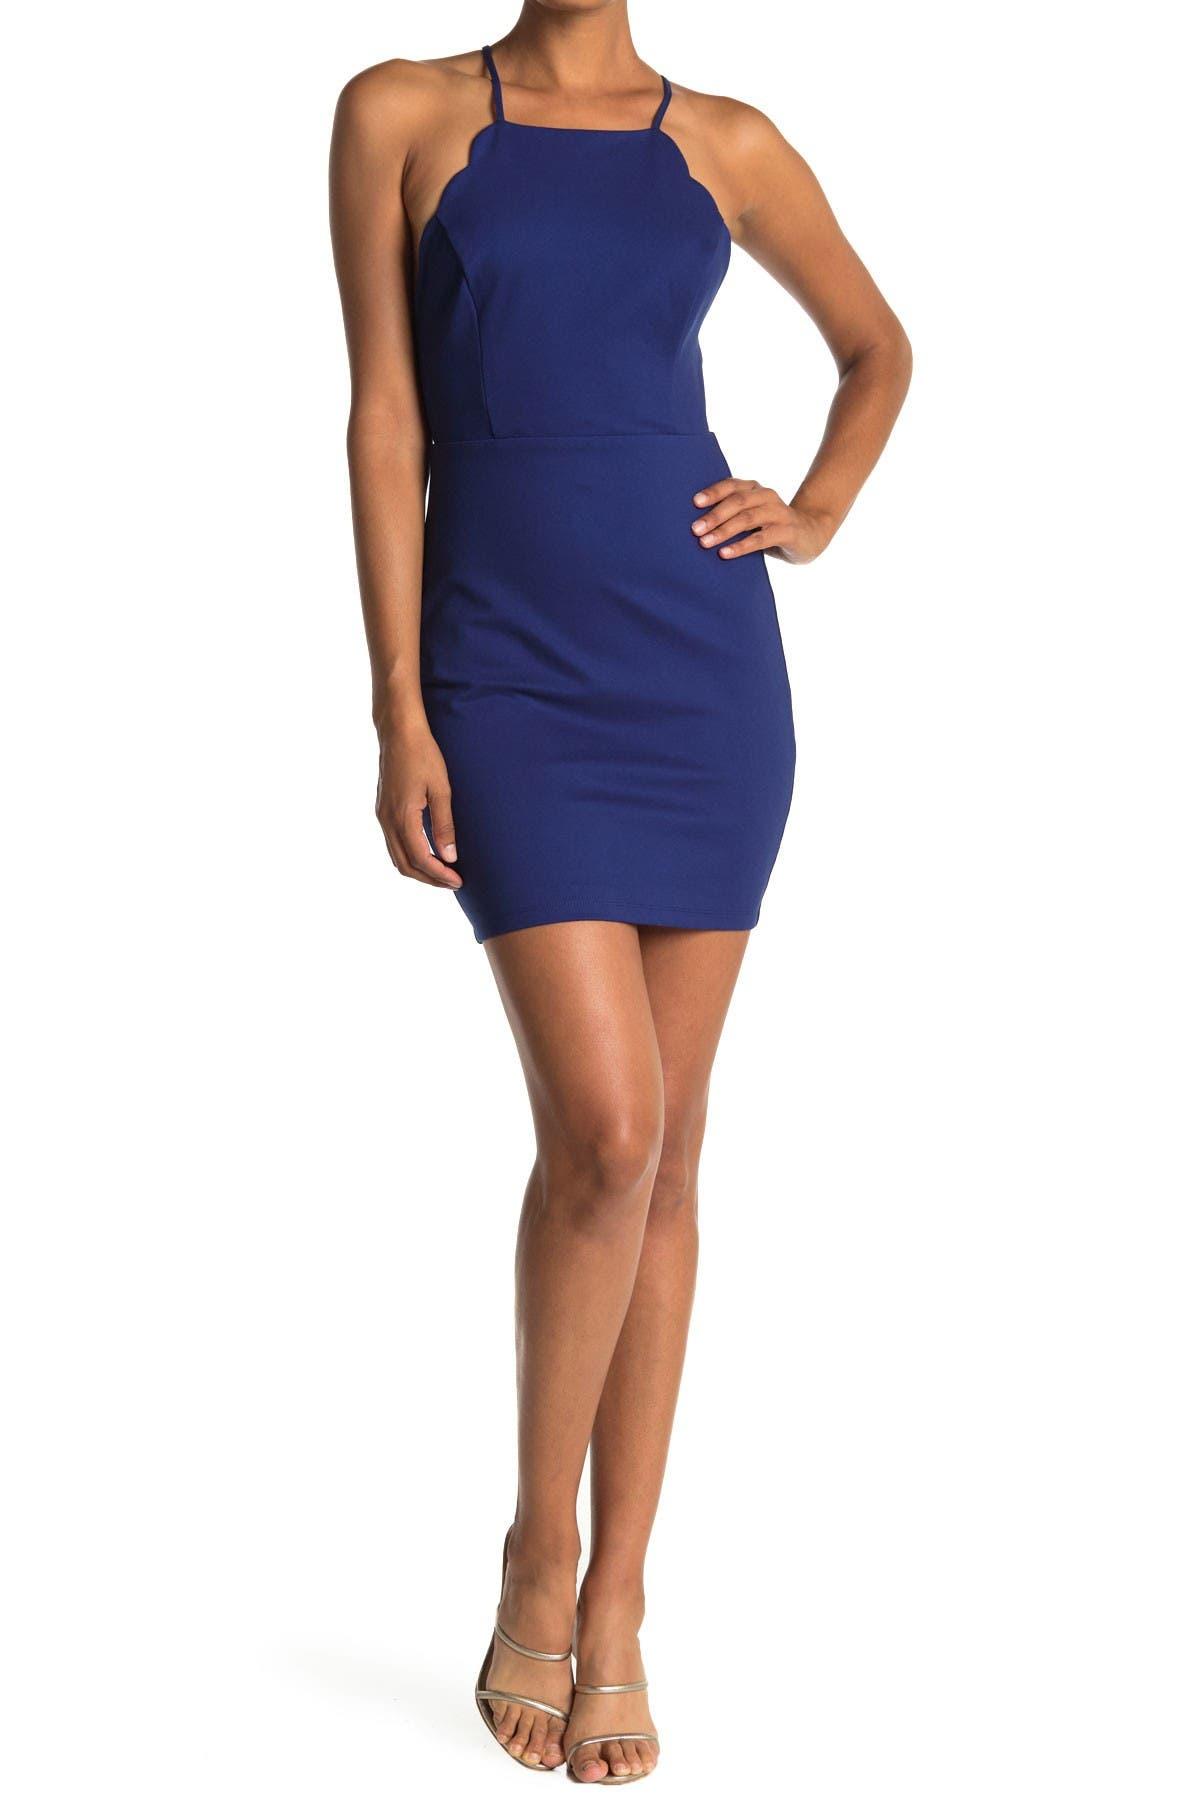 Image of Lush Scalloped Sleeveless Dress